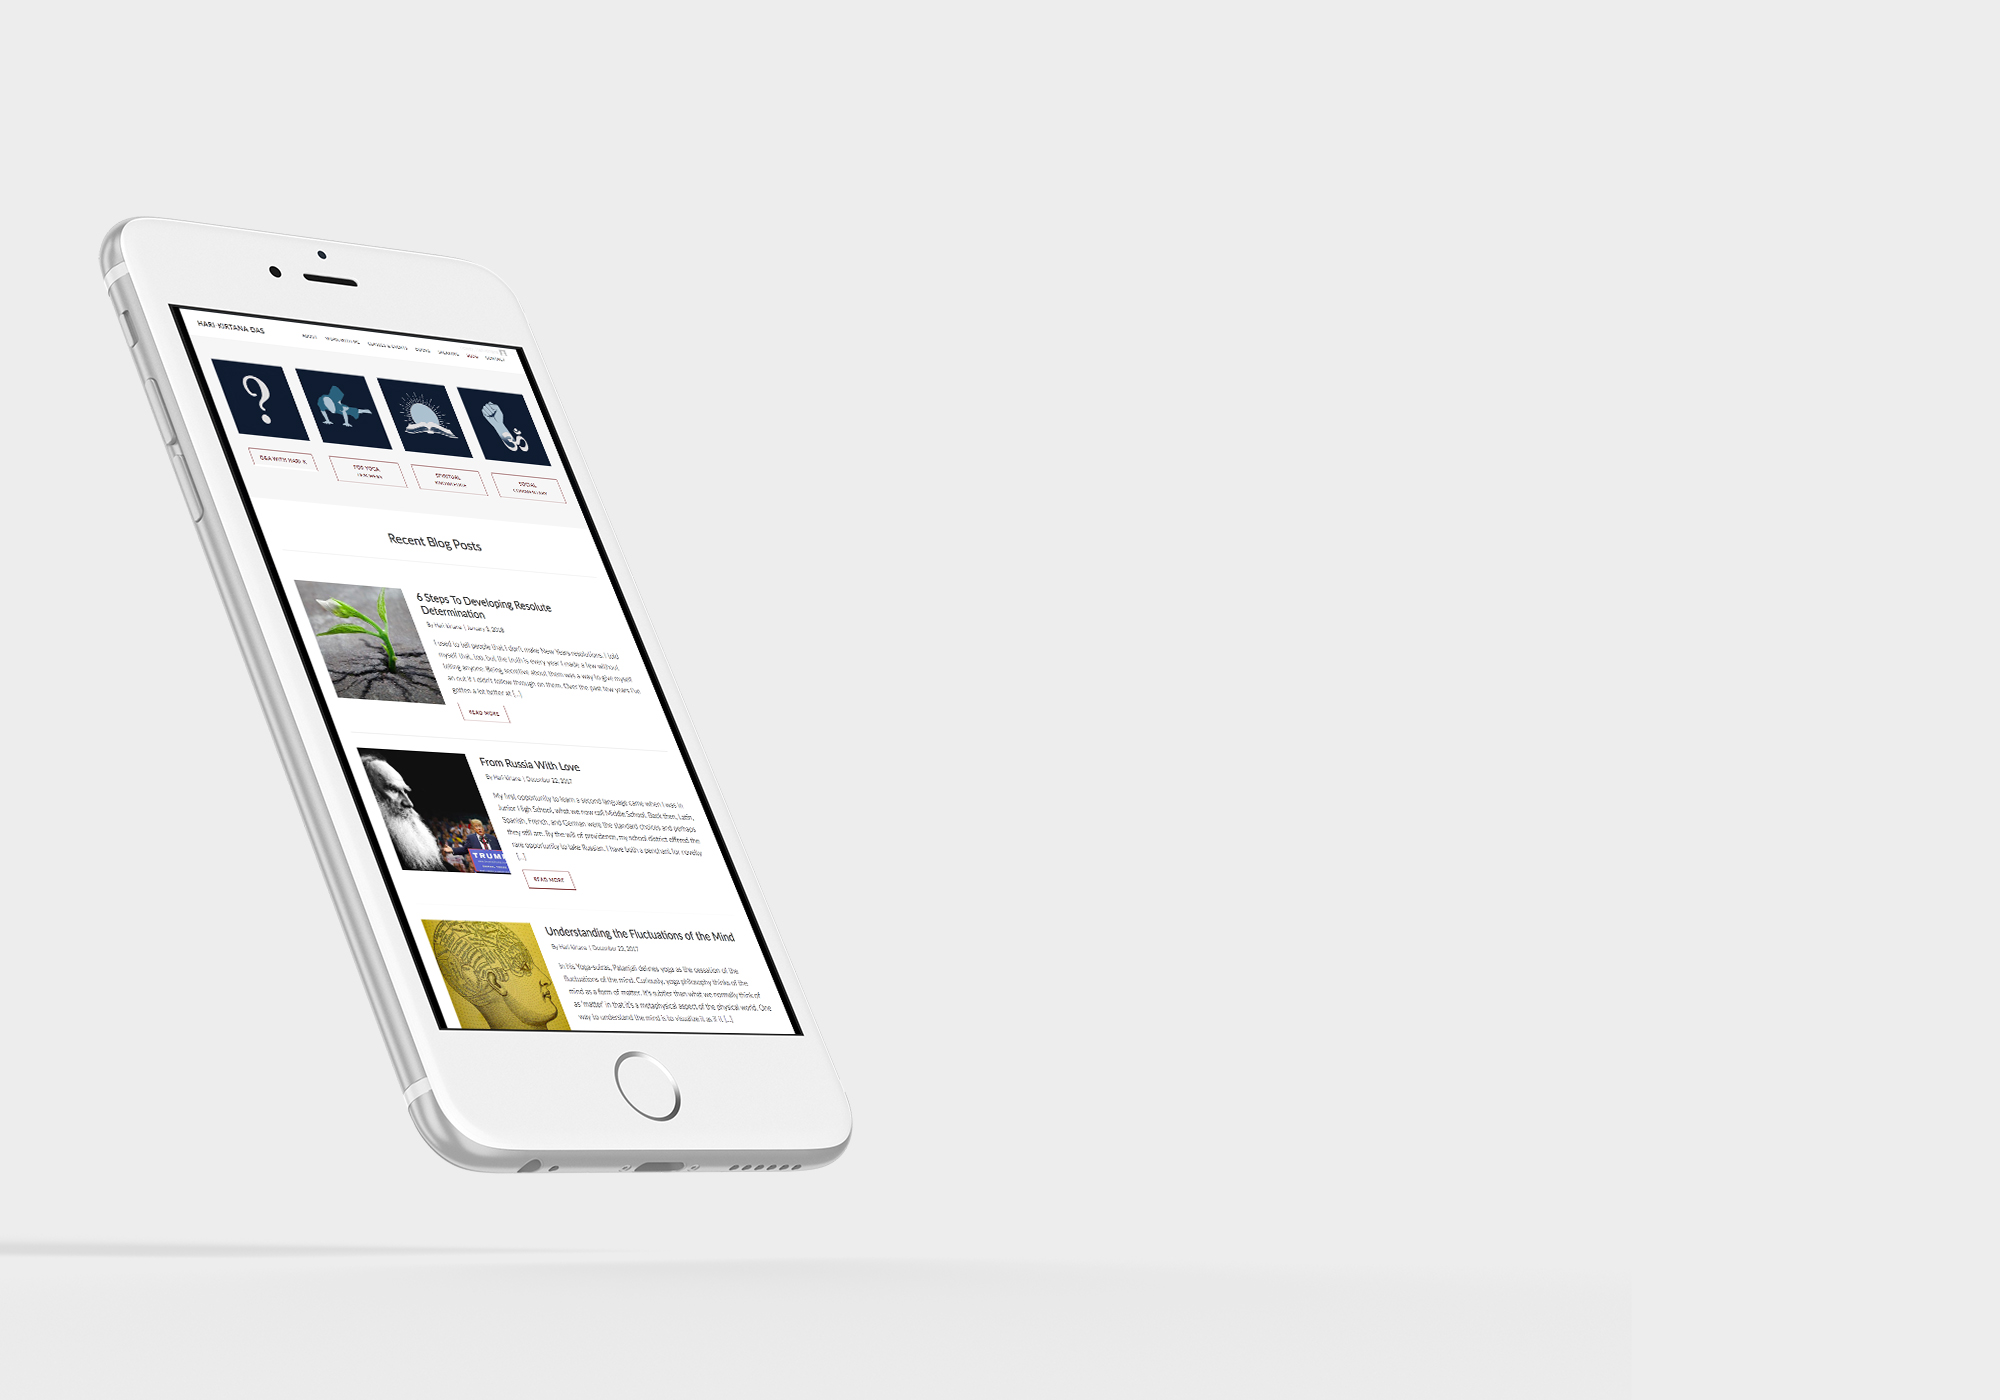 iphone mockup of Hari-kirtana das' website